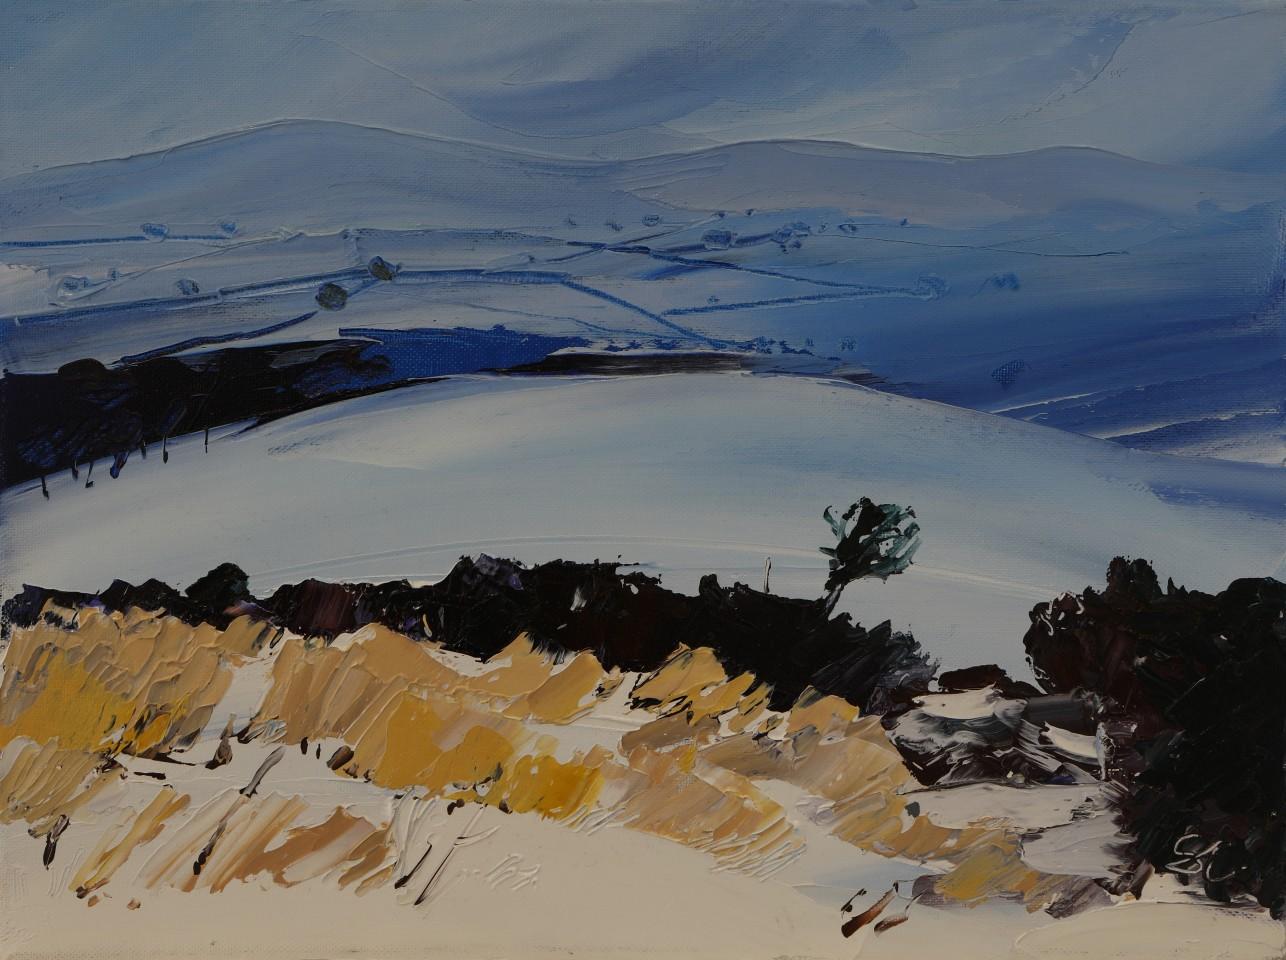 Sarah Carvell, Drifting Snow, Offas Dyke